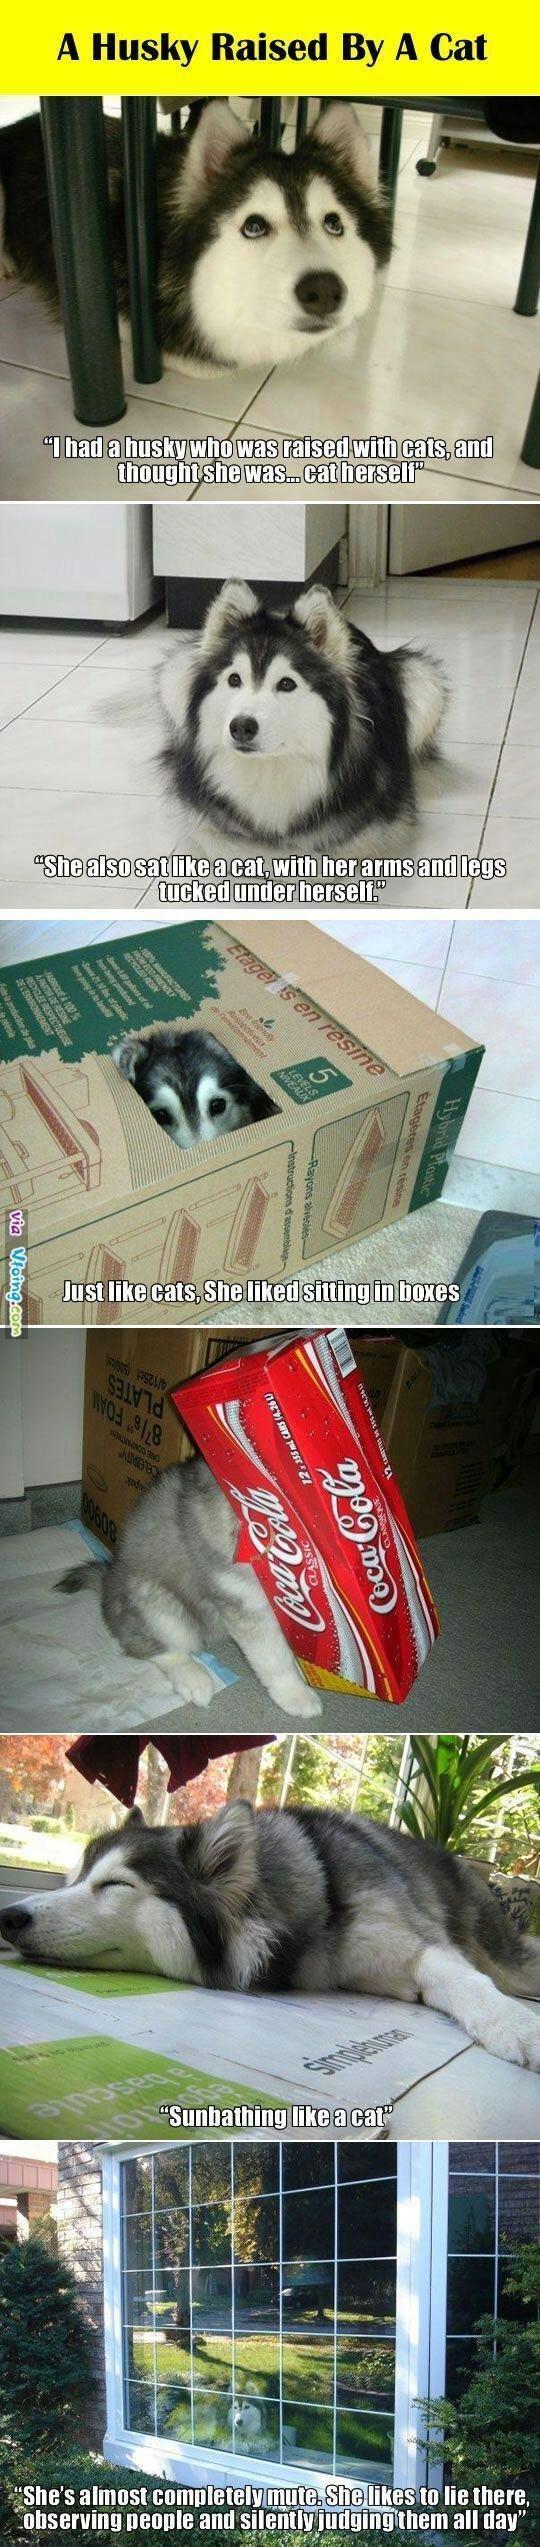 catdog. . 11 Husky Raised By A Cat. Because huskies. catdog 11 Husky Raised By A Cat Because huskies